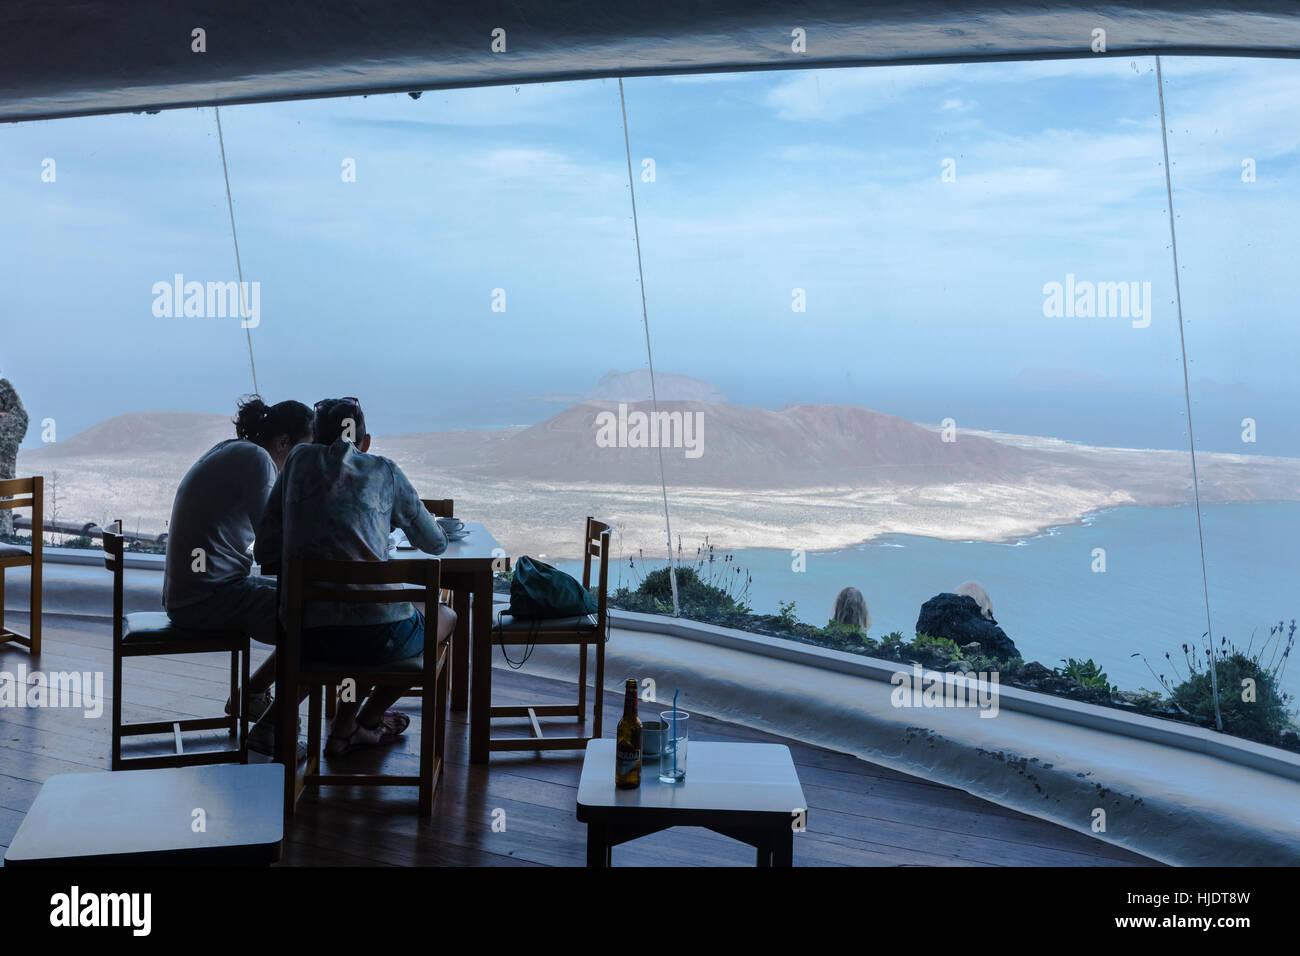 Mirador Del Rio, Lanzarote, Kanarische Inseln, Spanien Stockbild